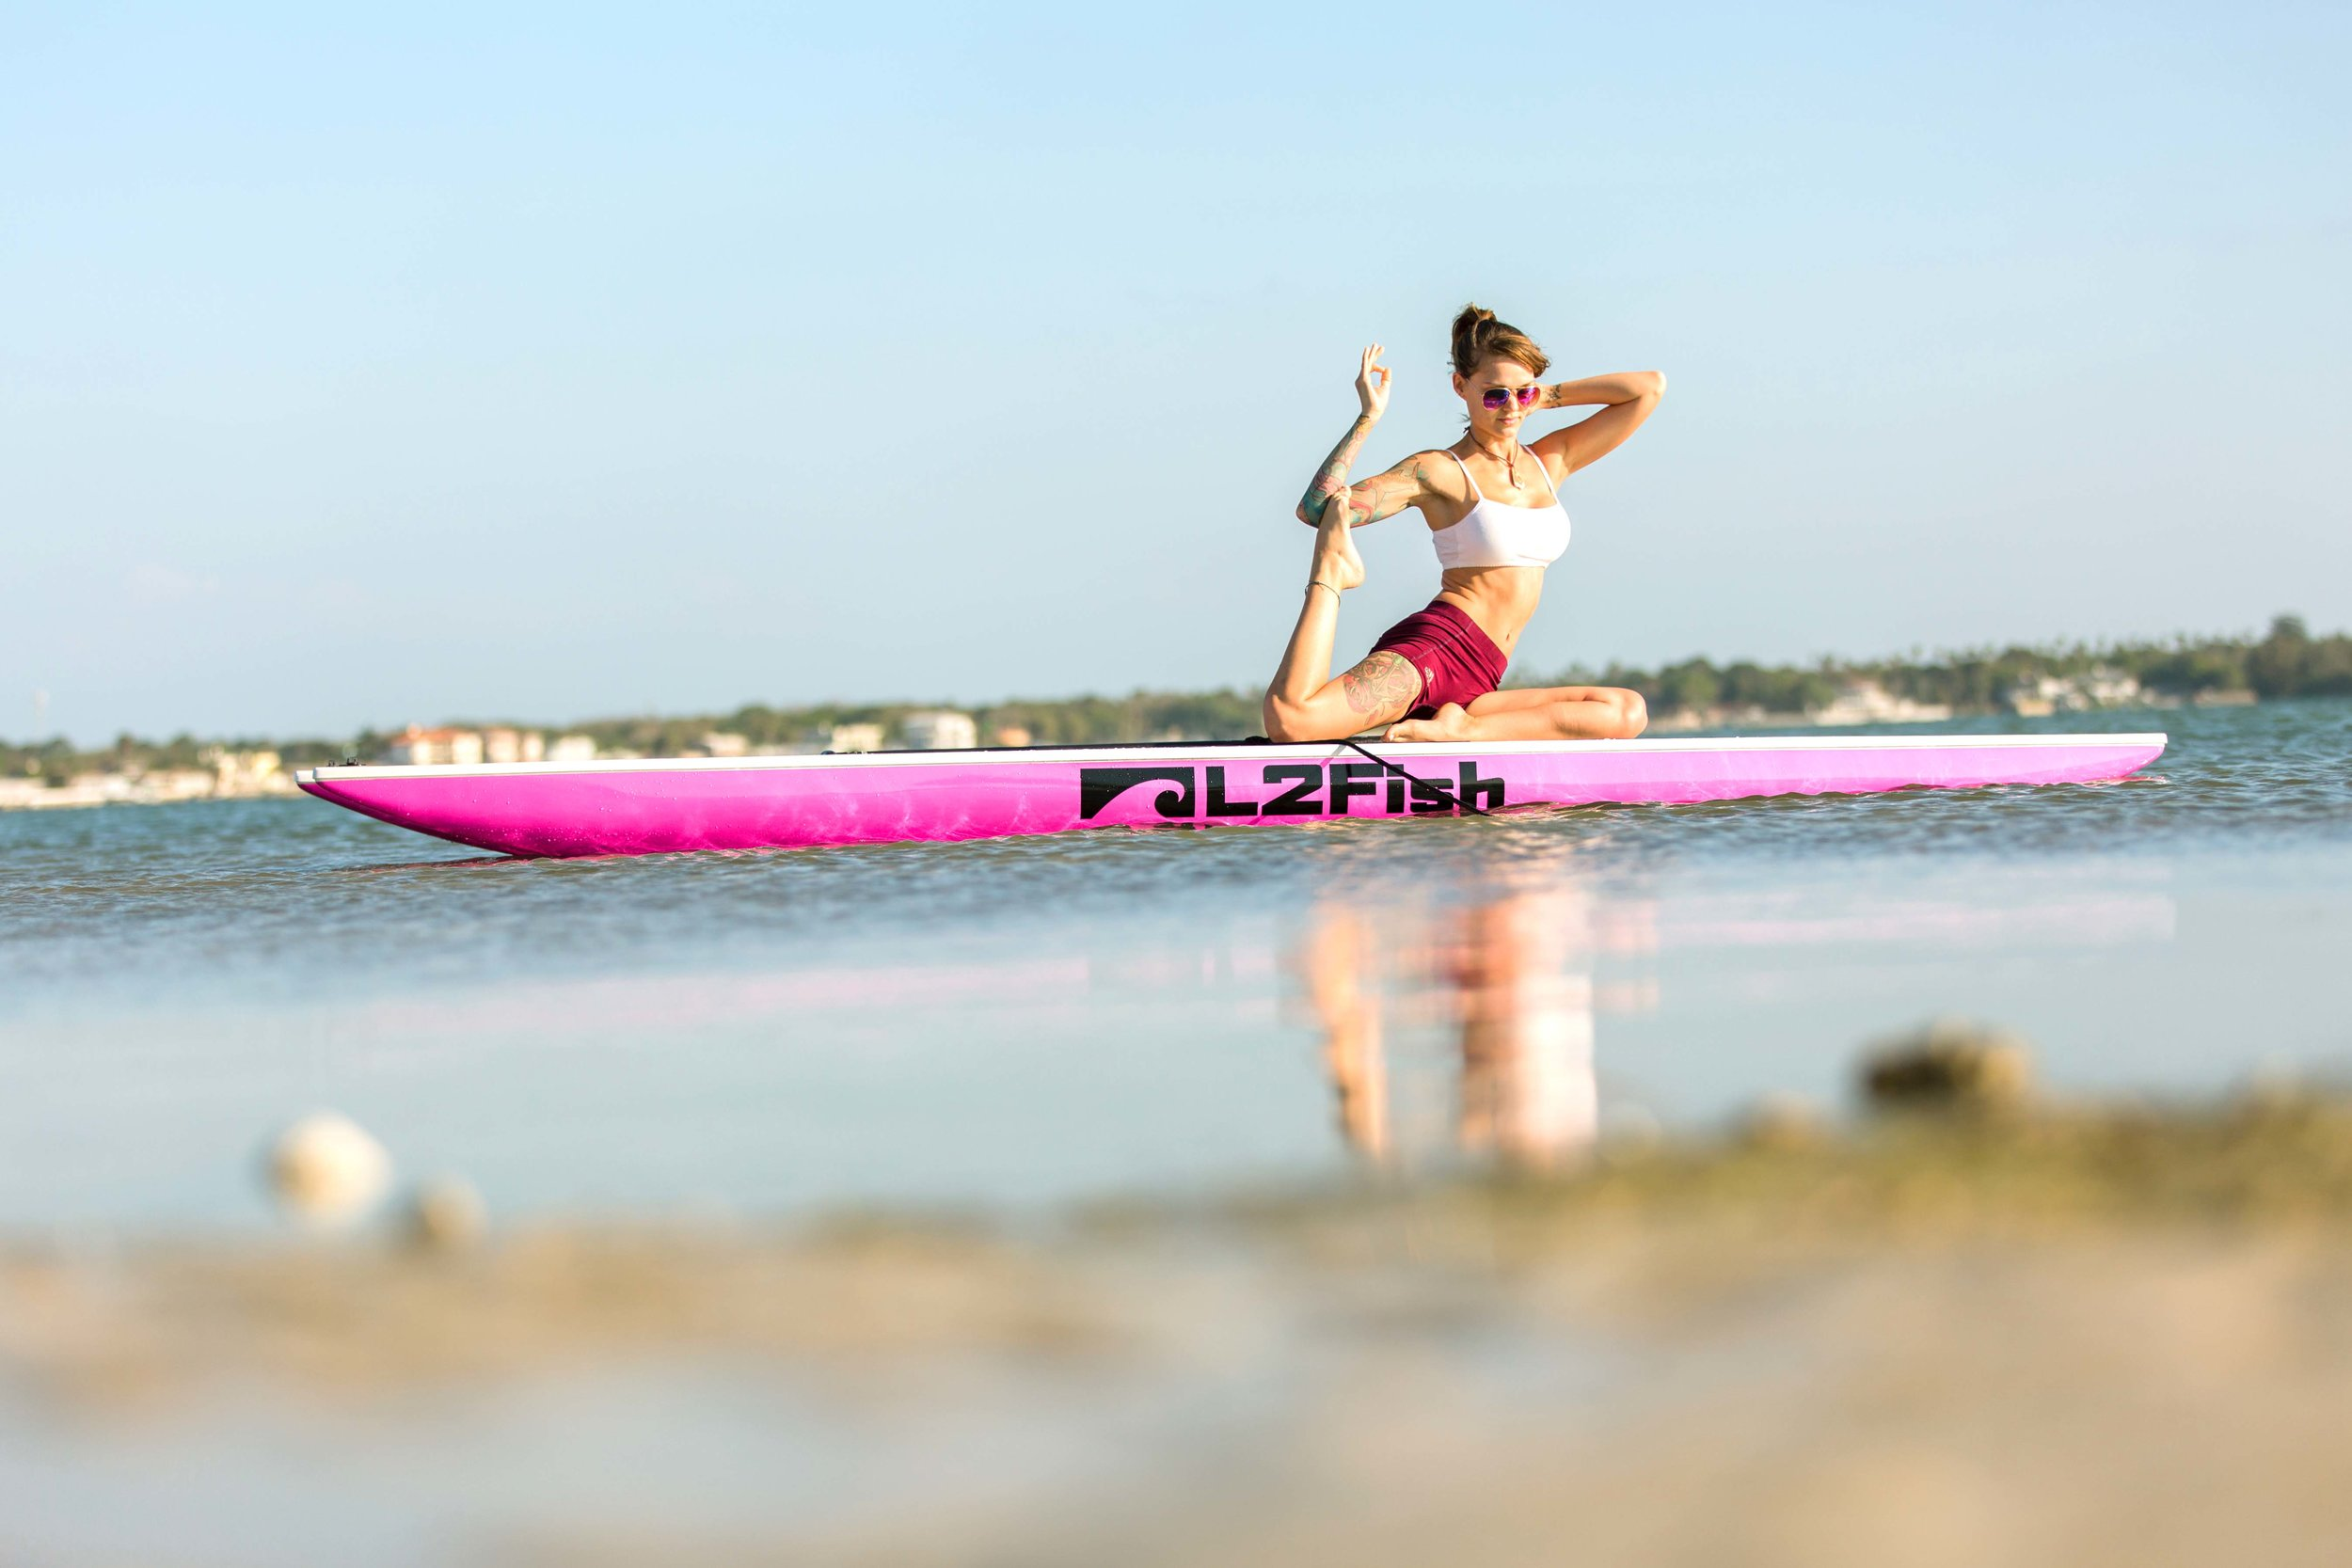 l2fishpaddleboardpink